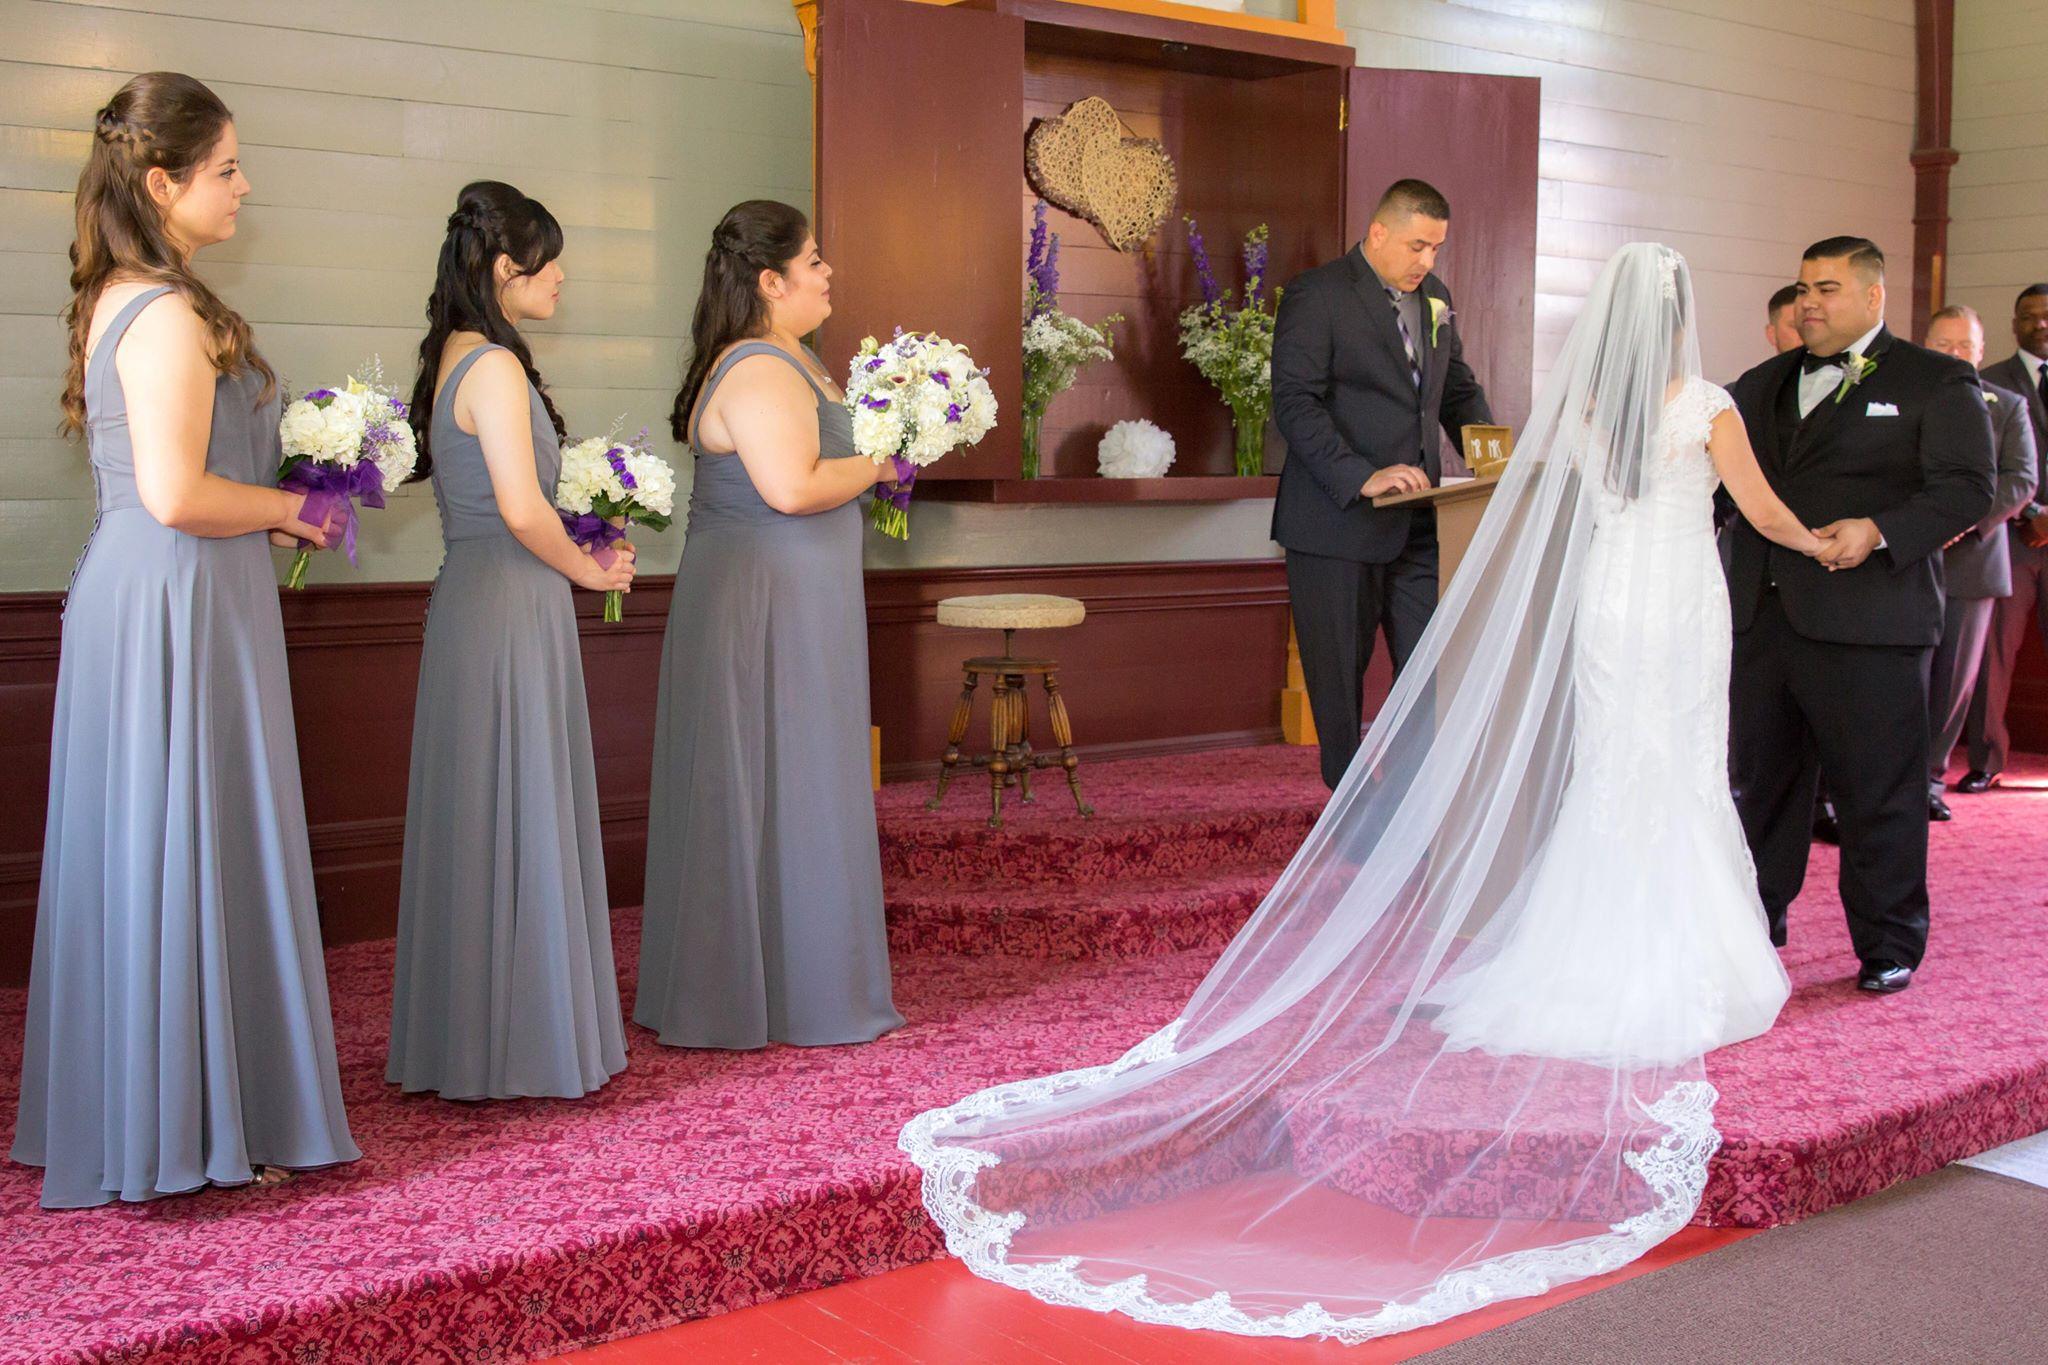 White Ivory Lace Edge Cathedral Length Wedding Bridal Veil